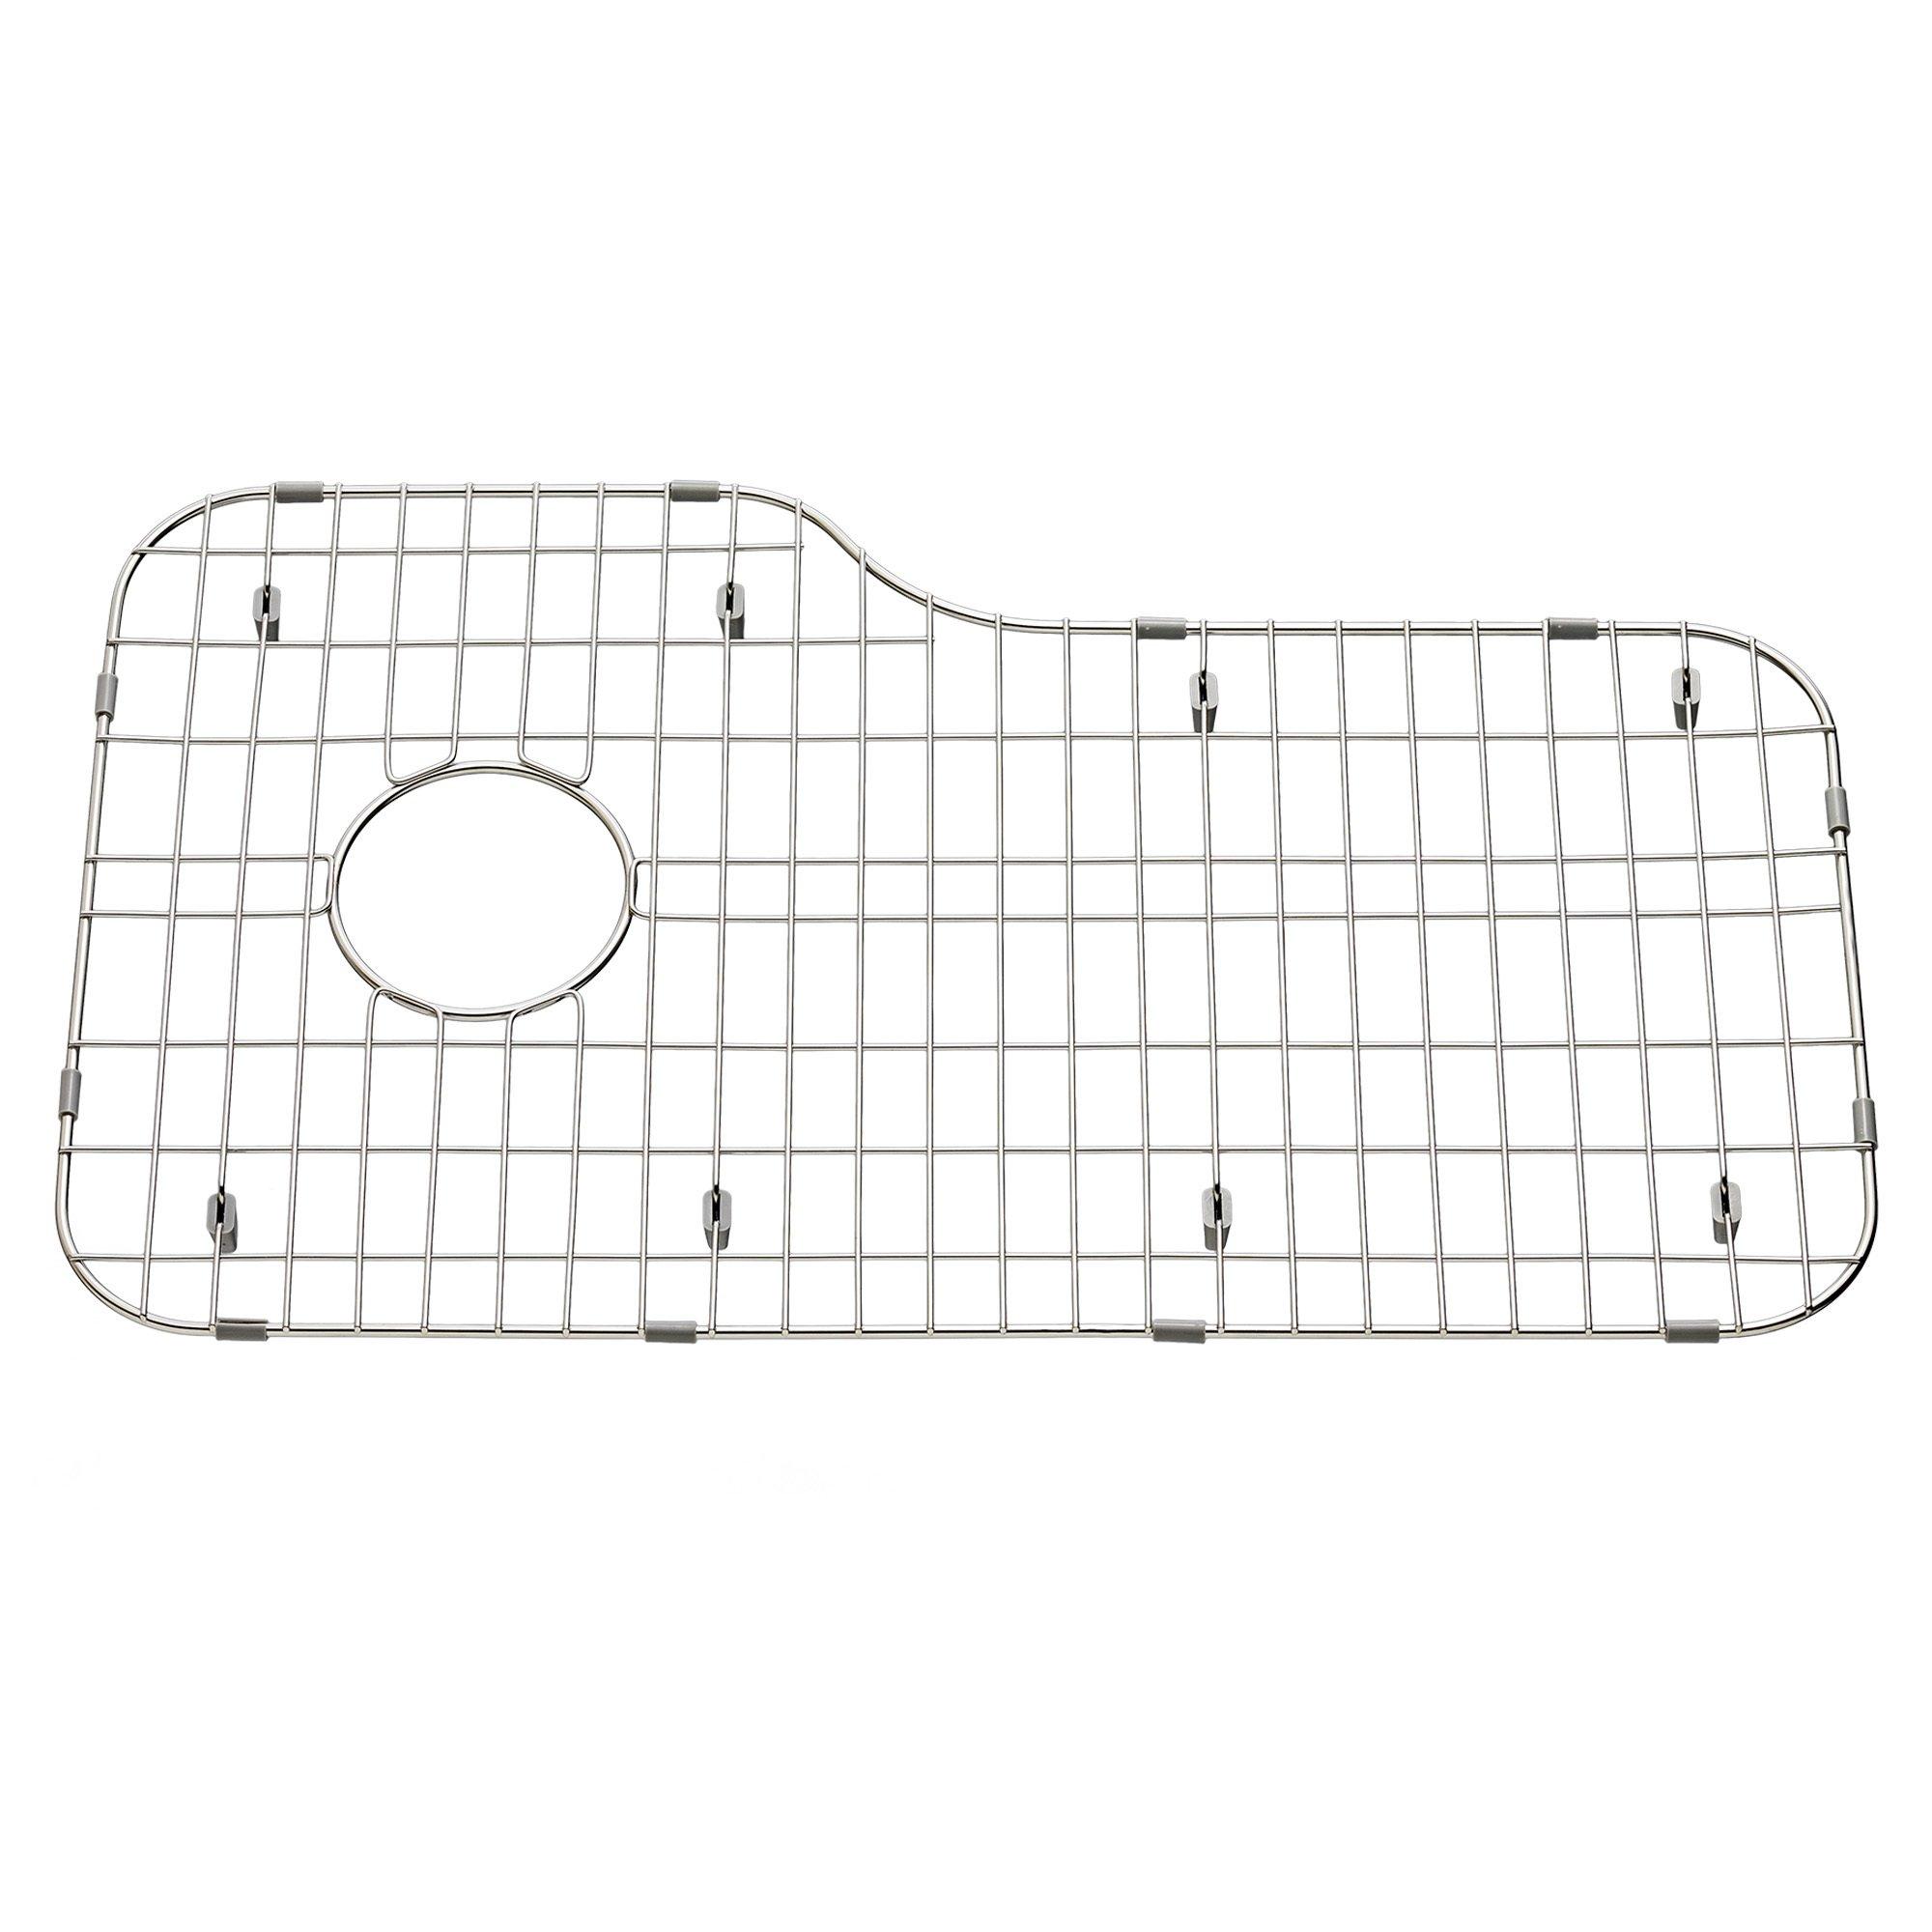 American Standard 7435000.075 26.77-in x 15.85-in Sink Grid, Stainless steel